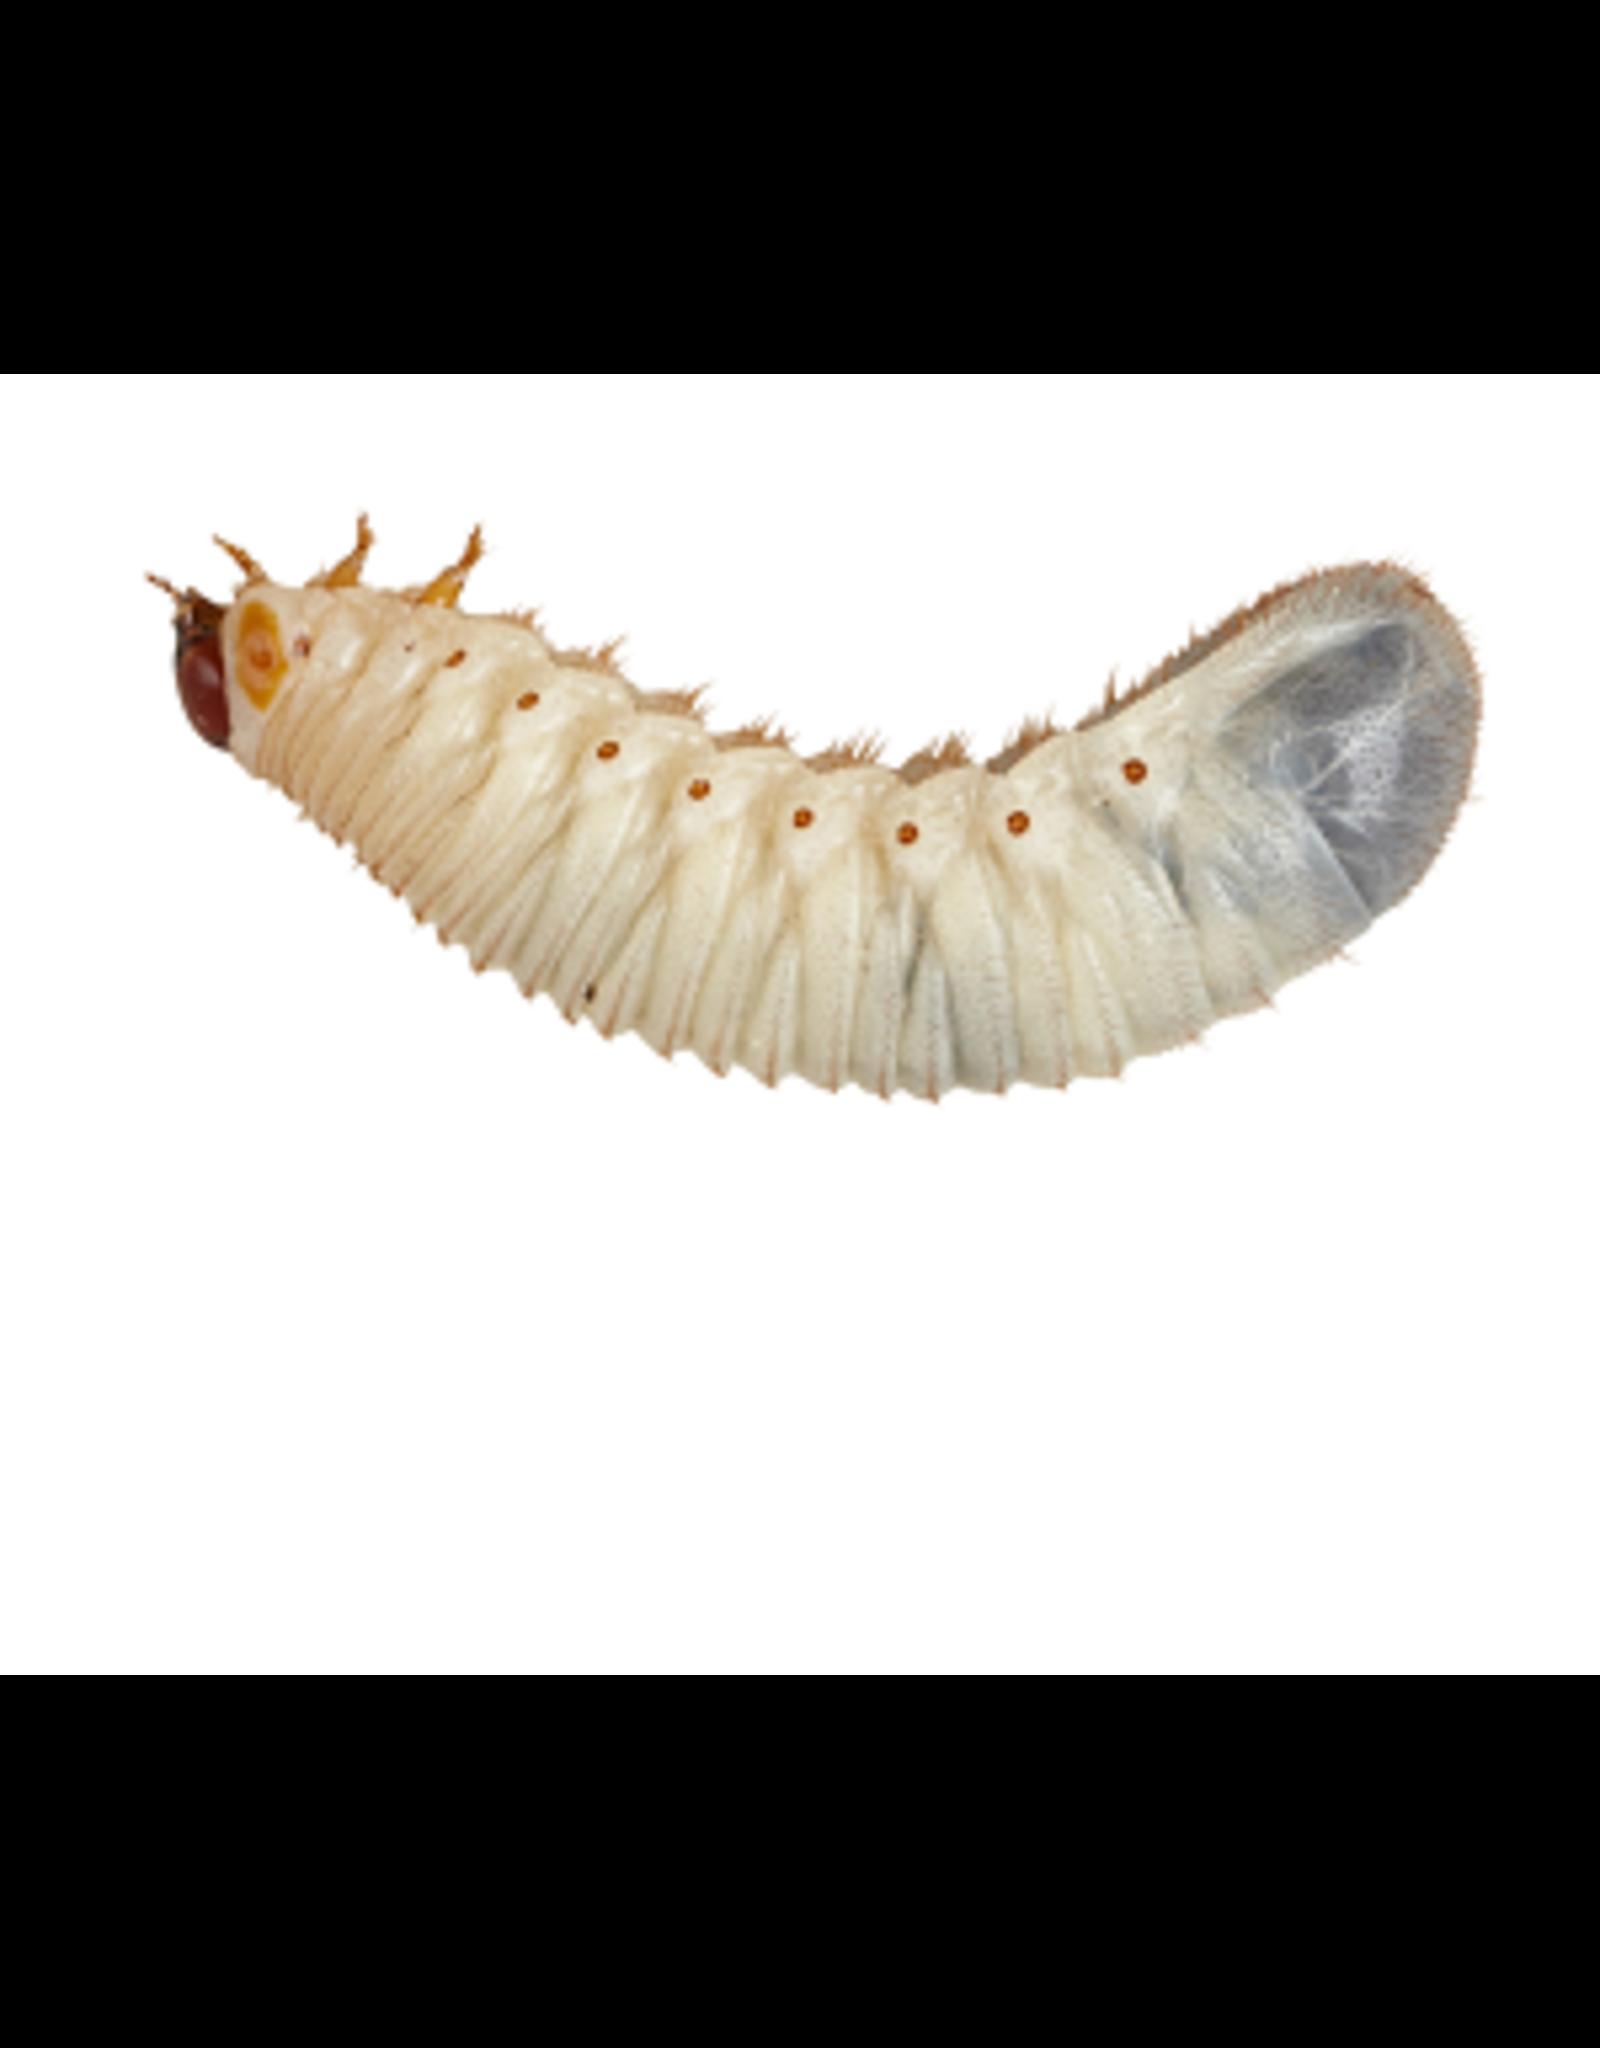 Angell Pets Fruit Beetle (Pachnoda) Grubs